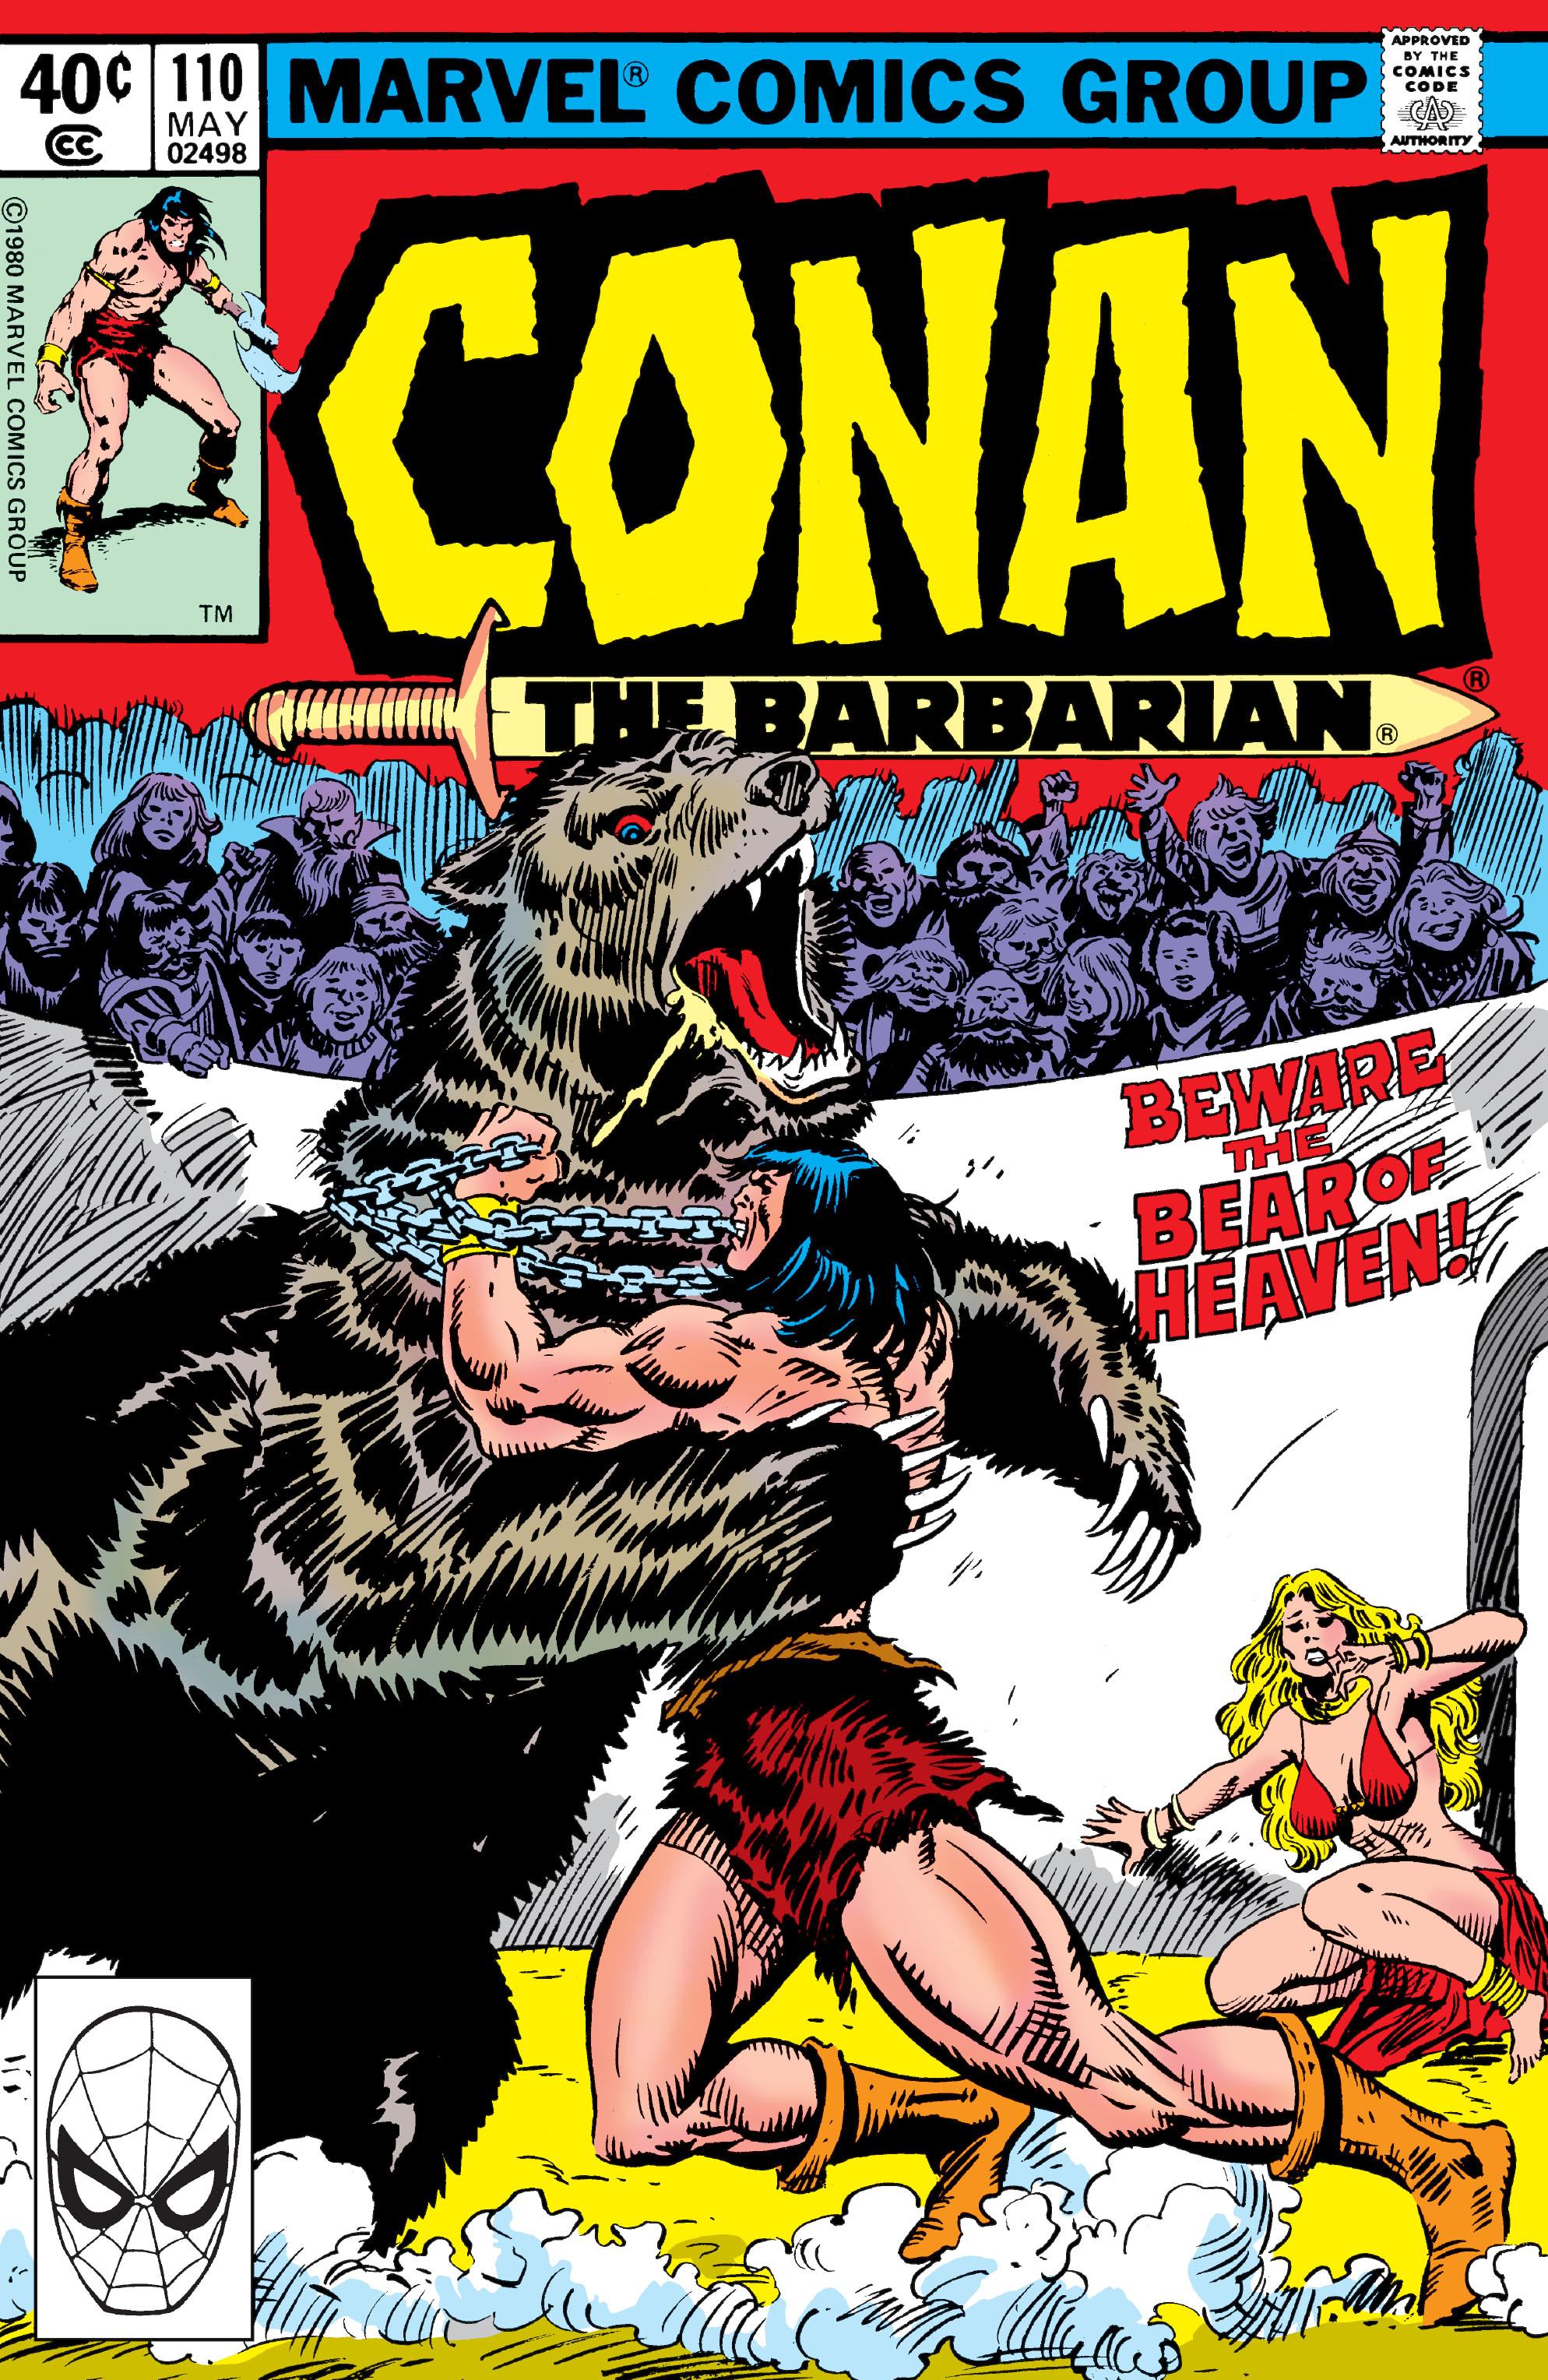 Conan the Barbarian Vol 1 110